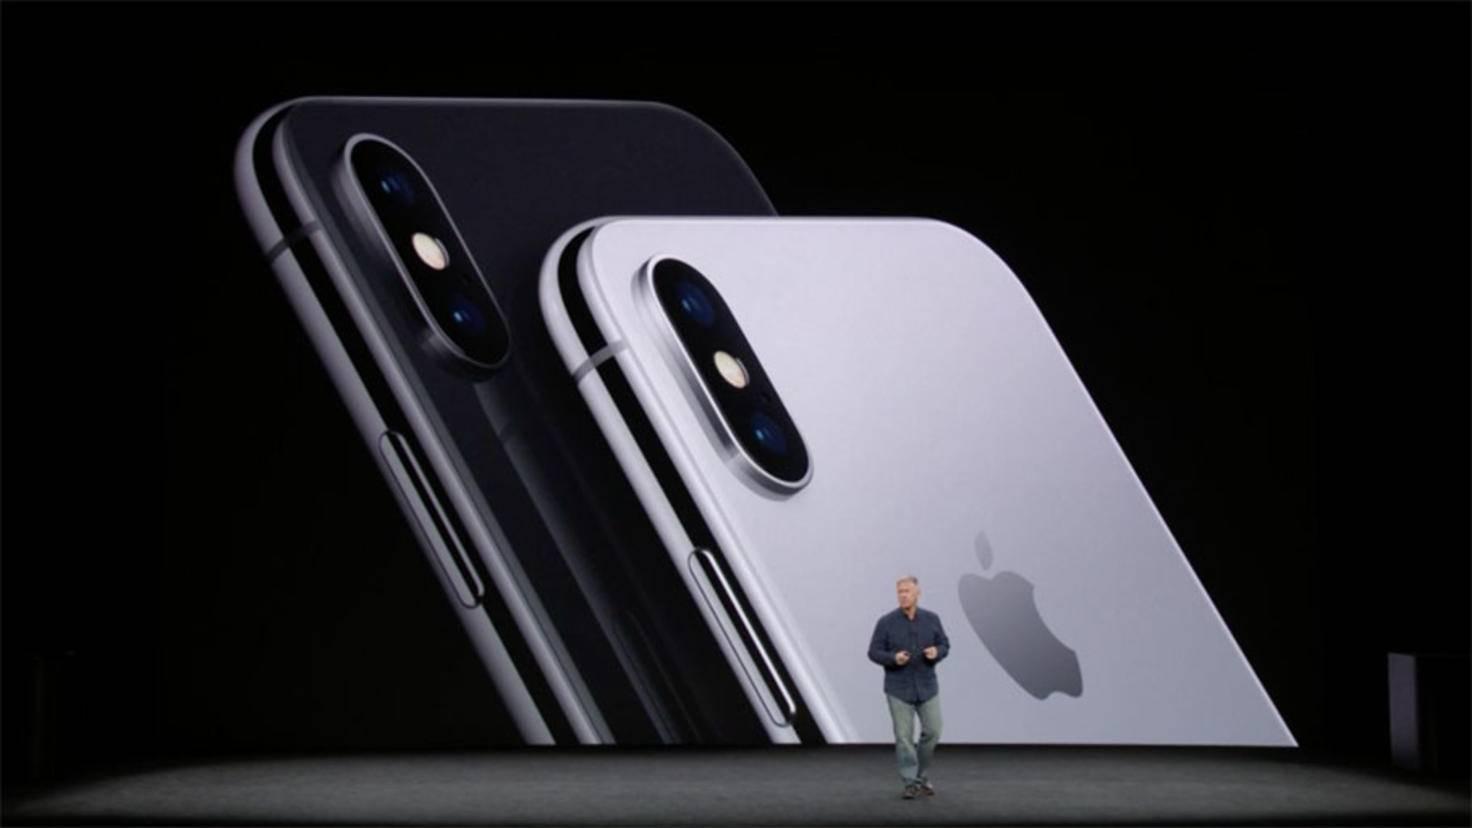 iphone-x-2-keynote-2017